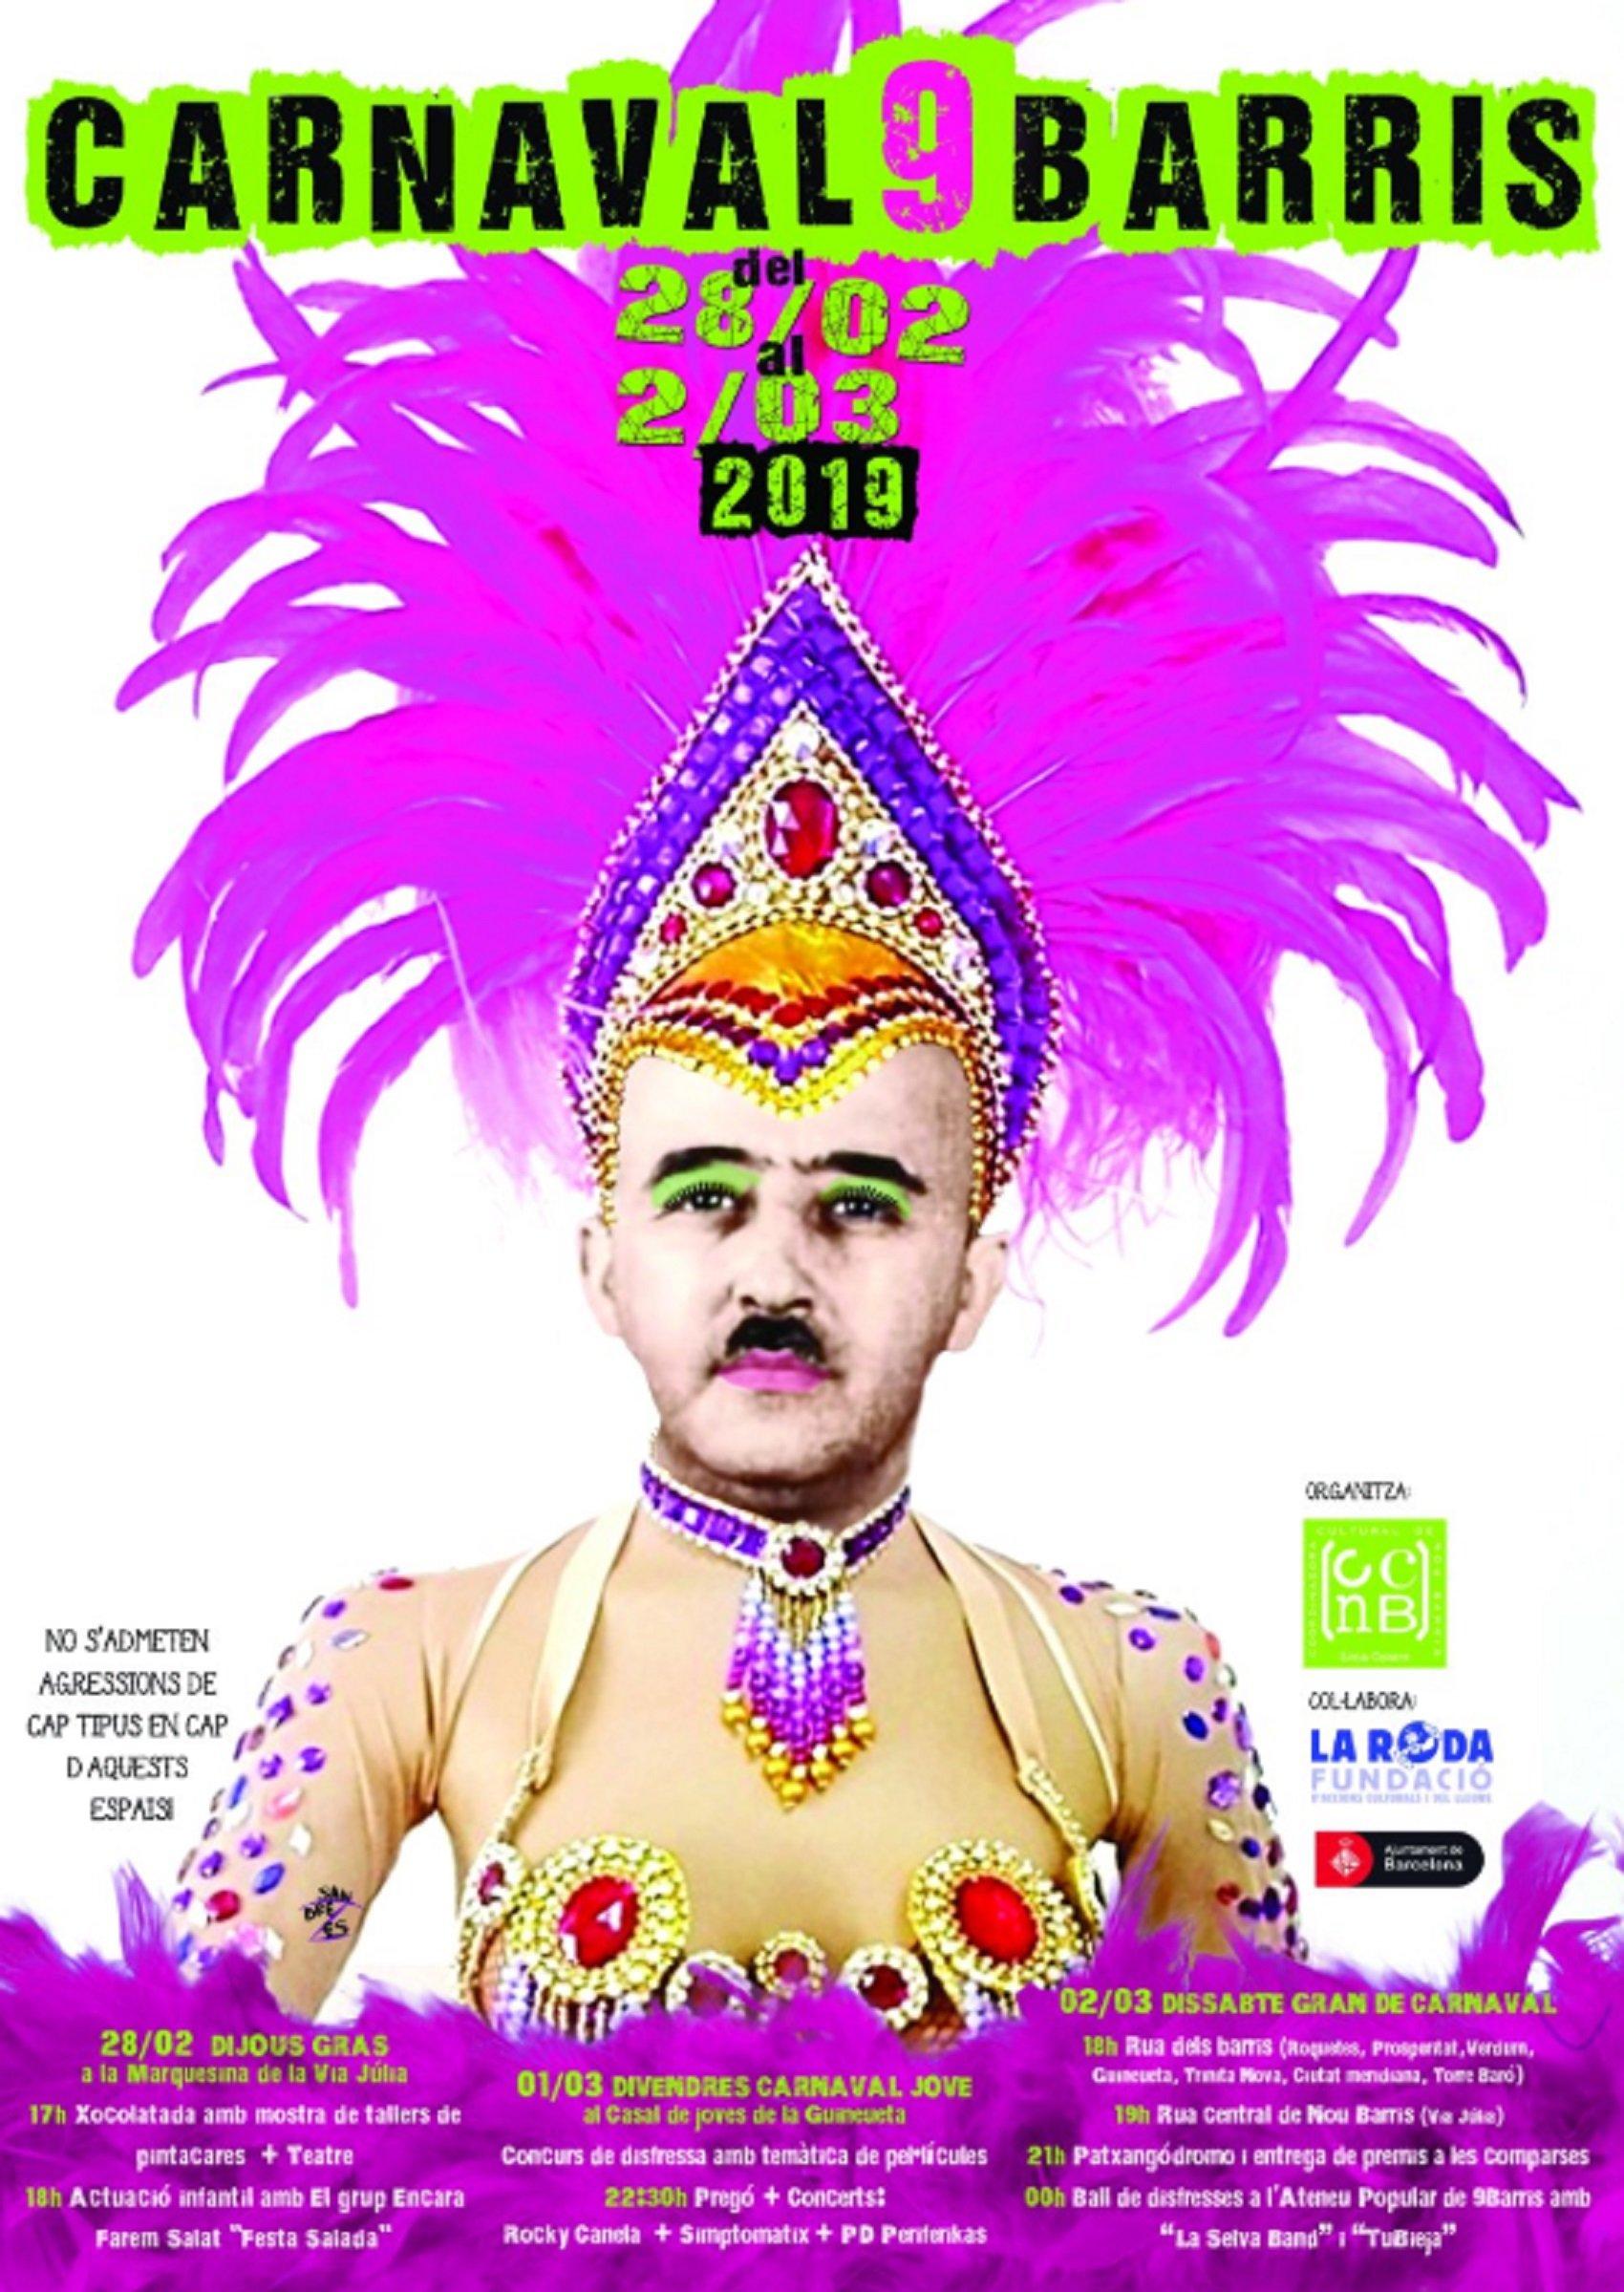 carnaval nou barris @xavartal